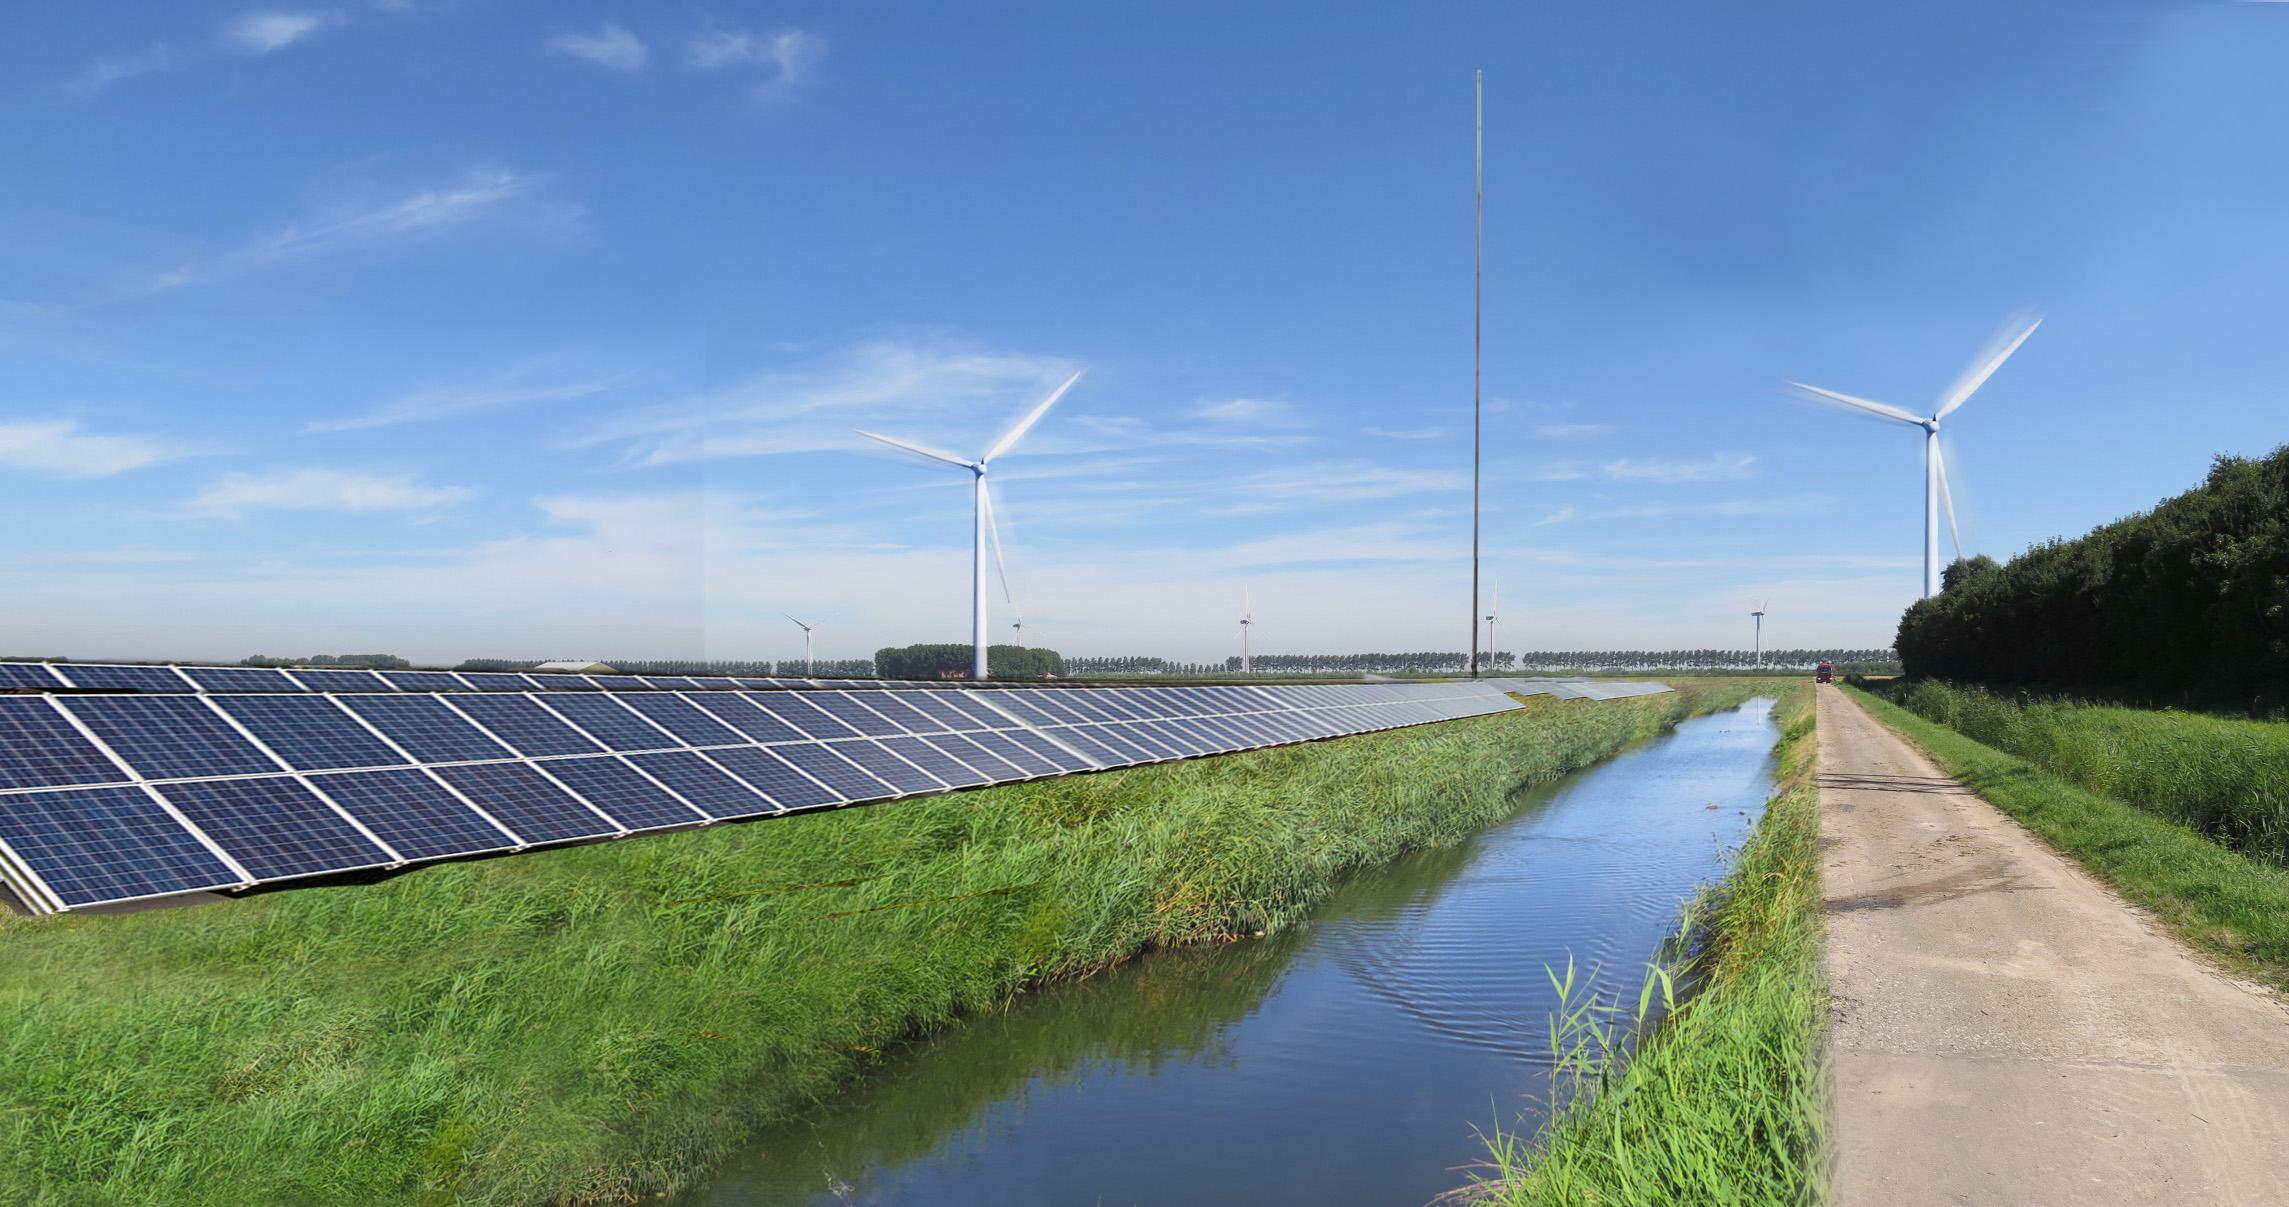 Vattenfall bouwt haar grootste Europese hybride energiepark in Goeree-Overflakkee